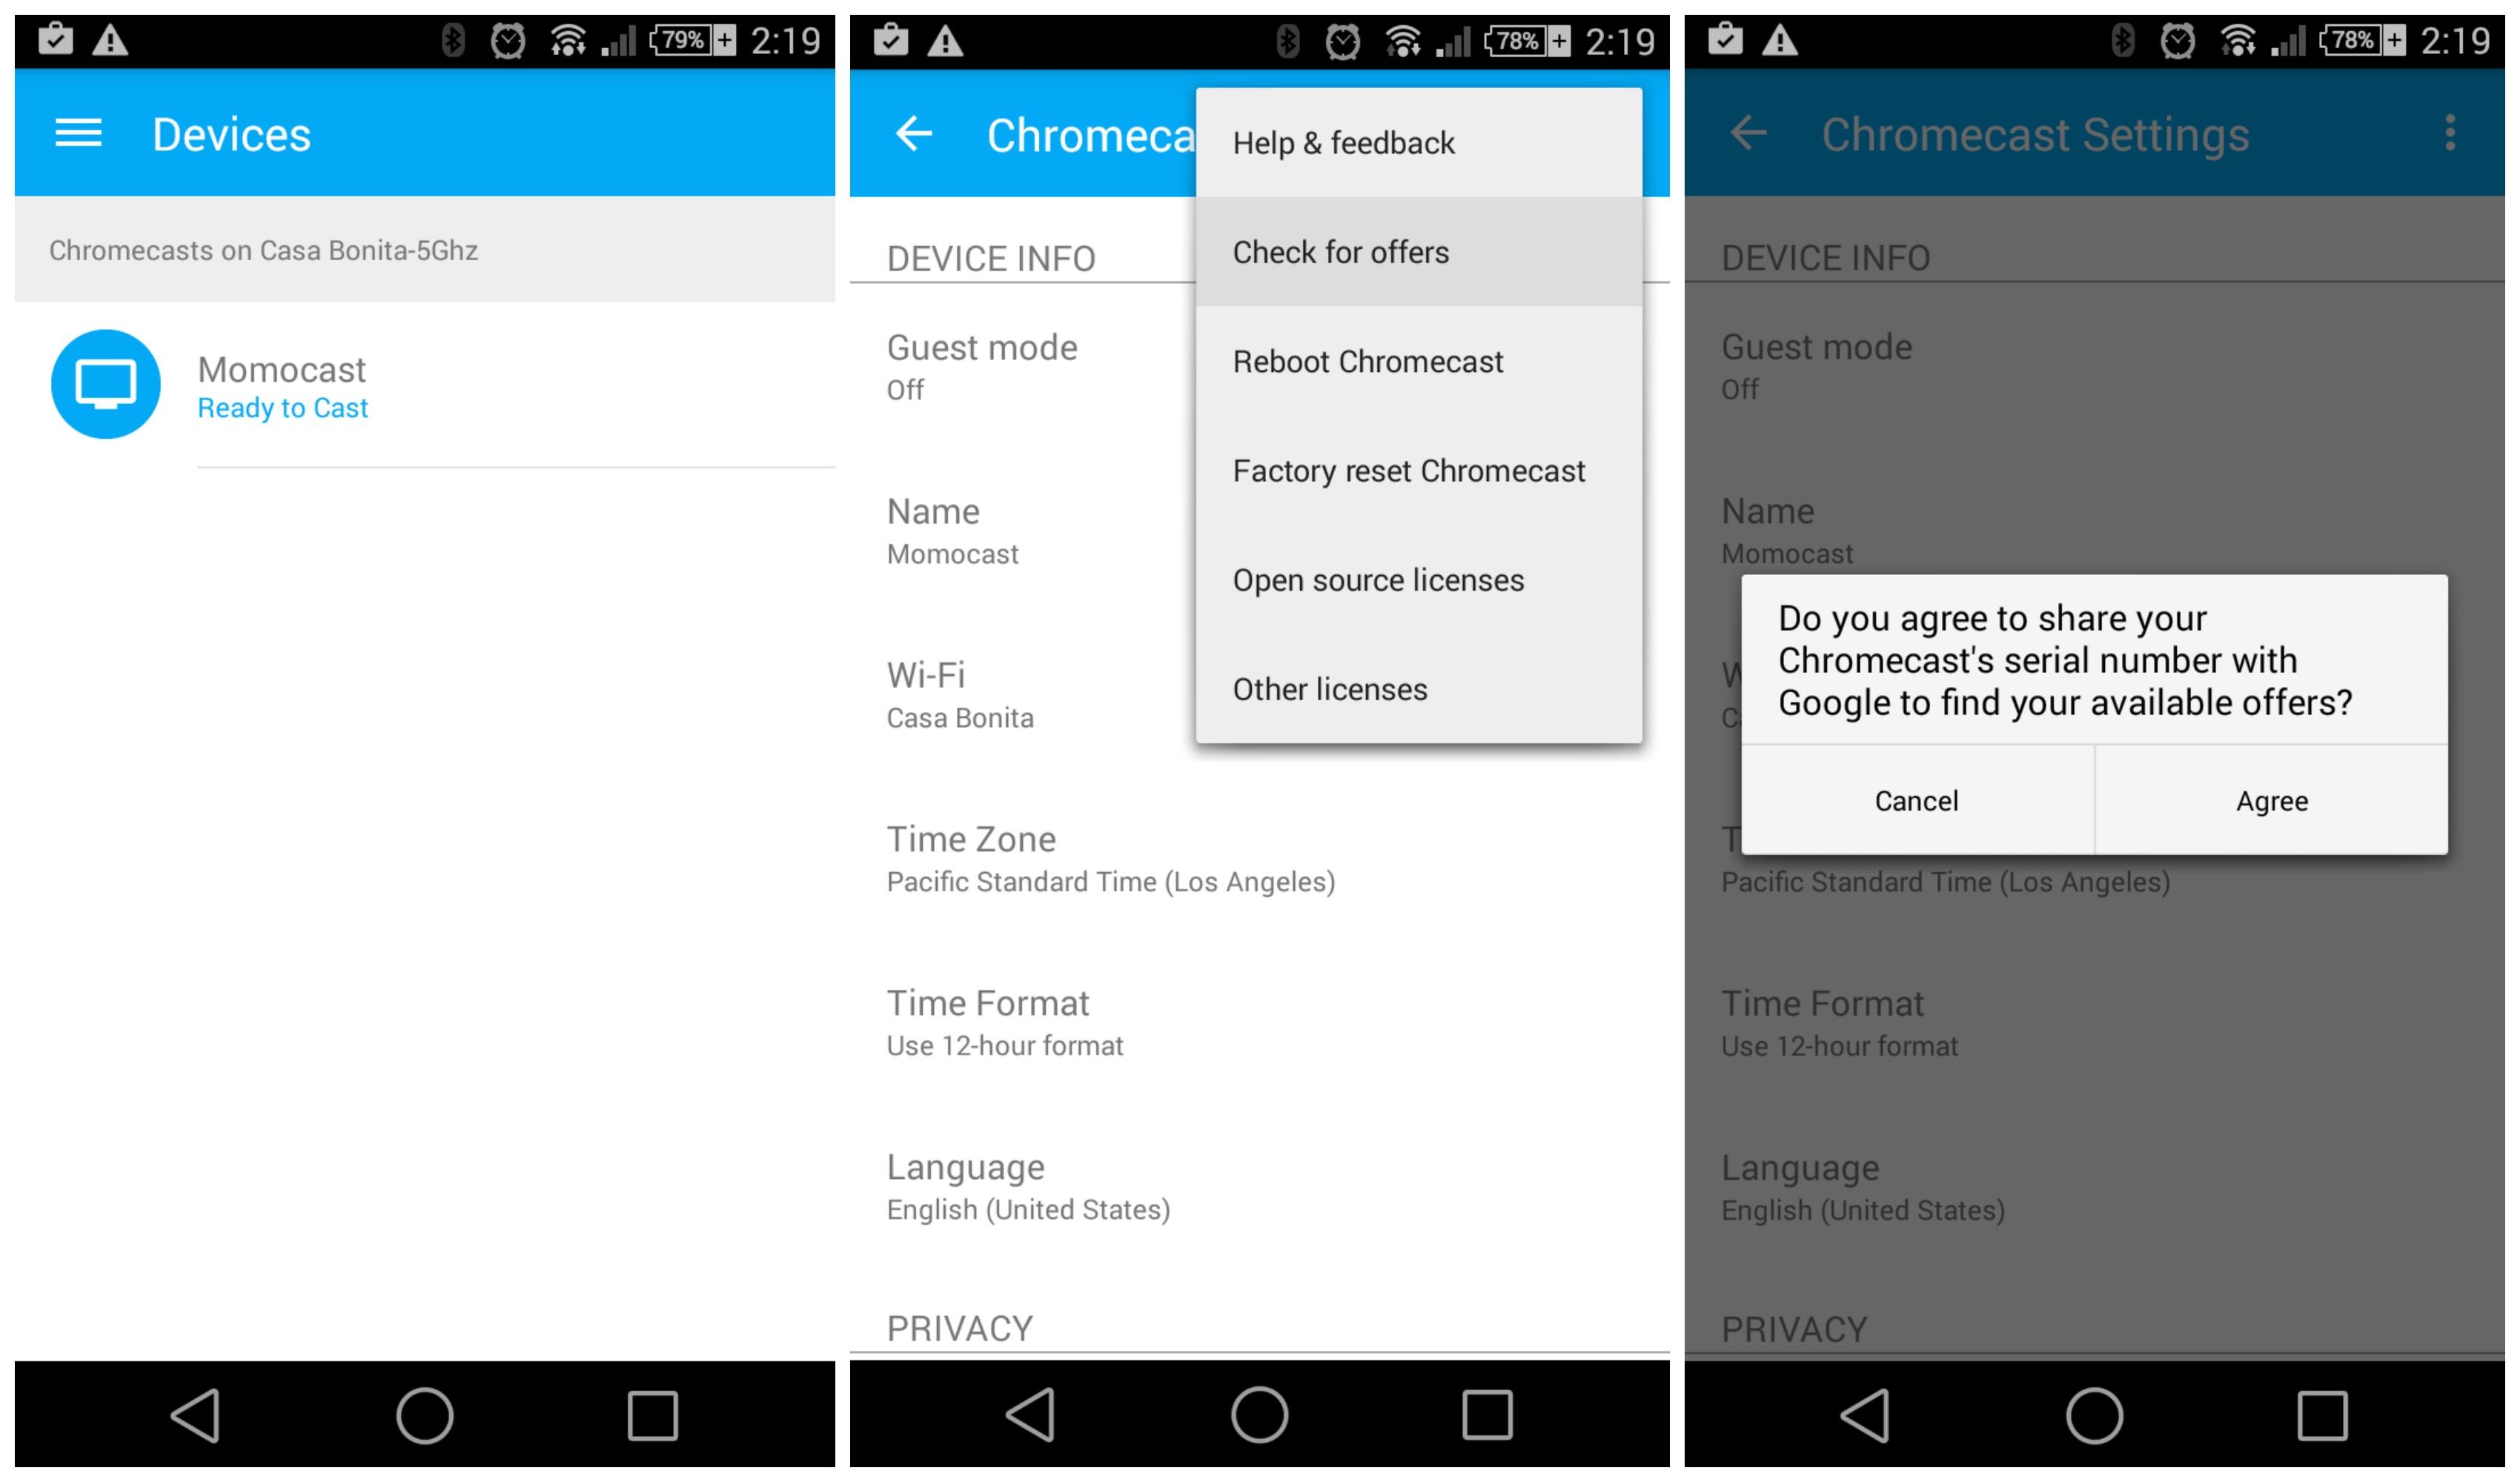 Google Play credit hidden inside Chromecast app